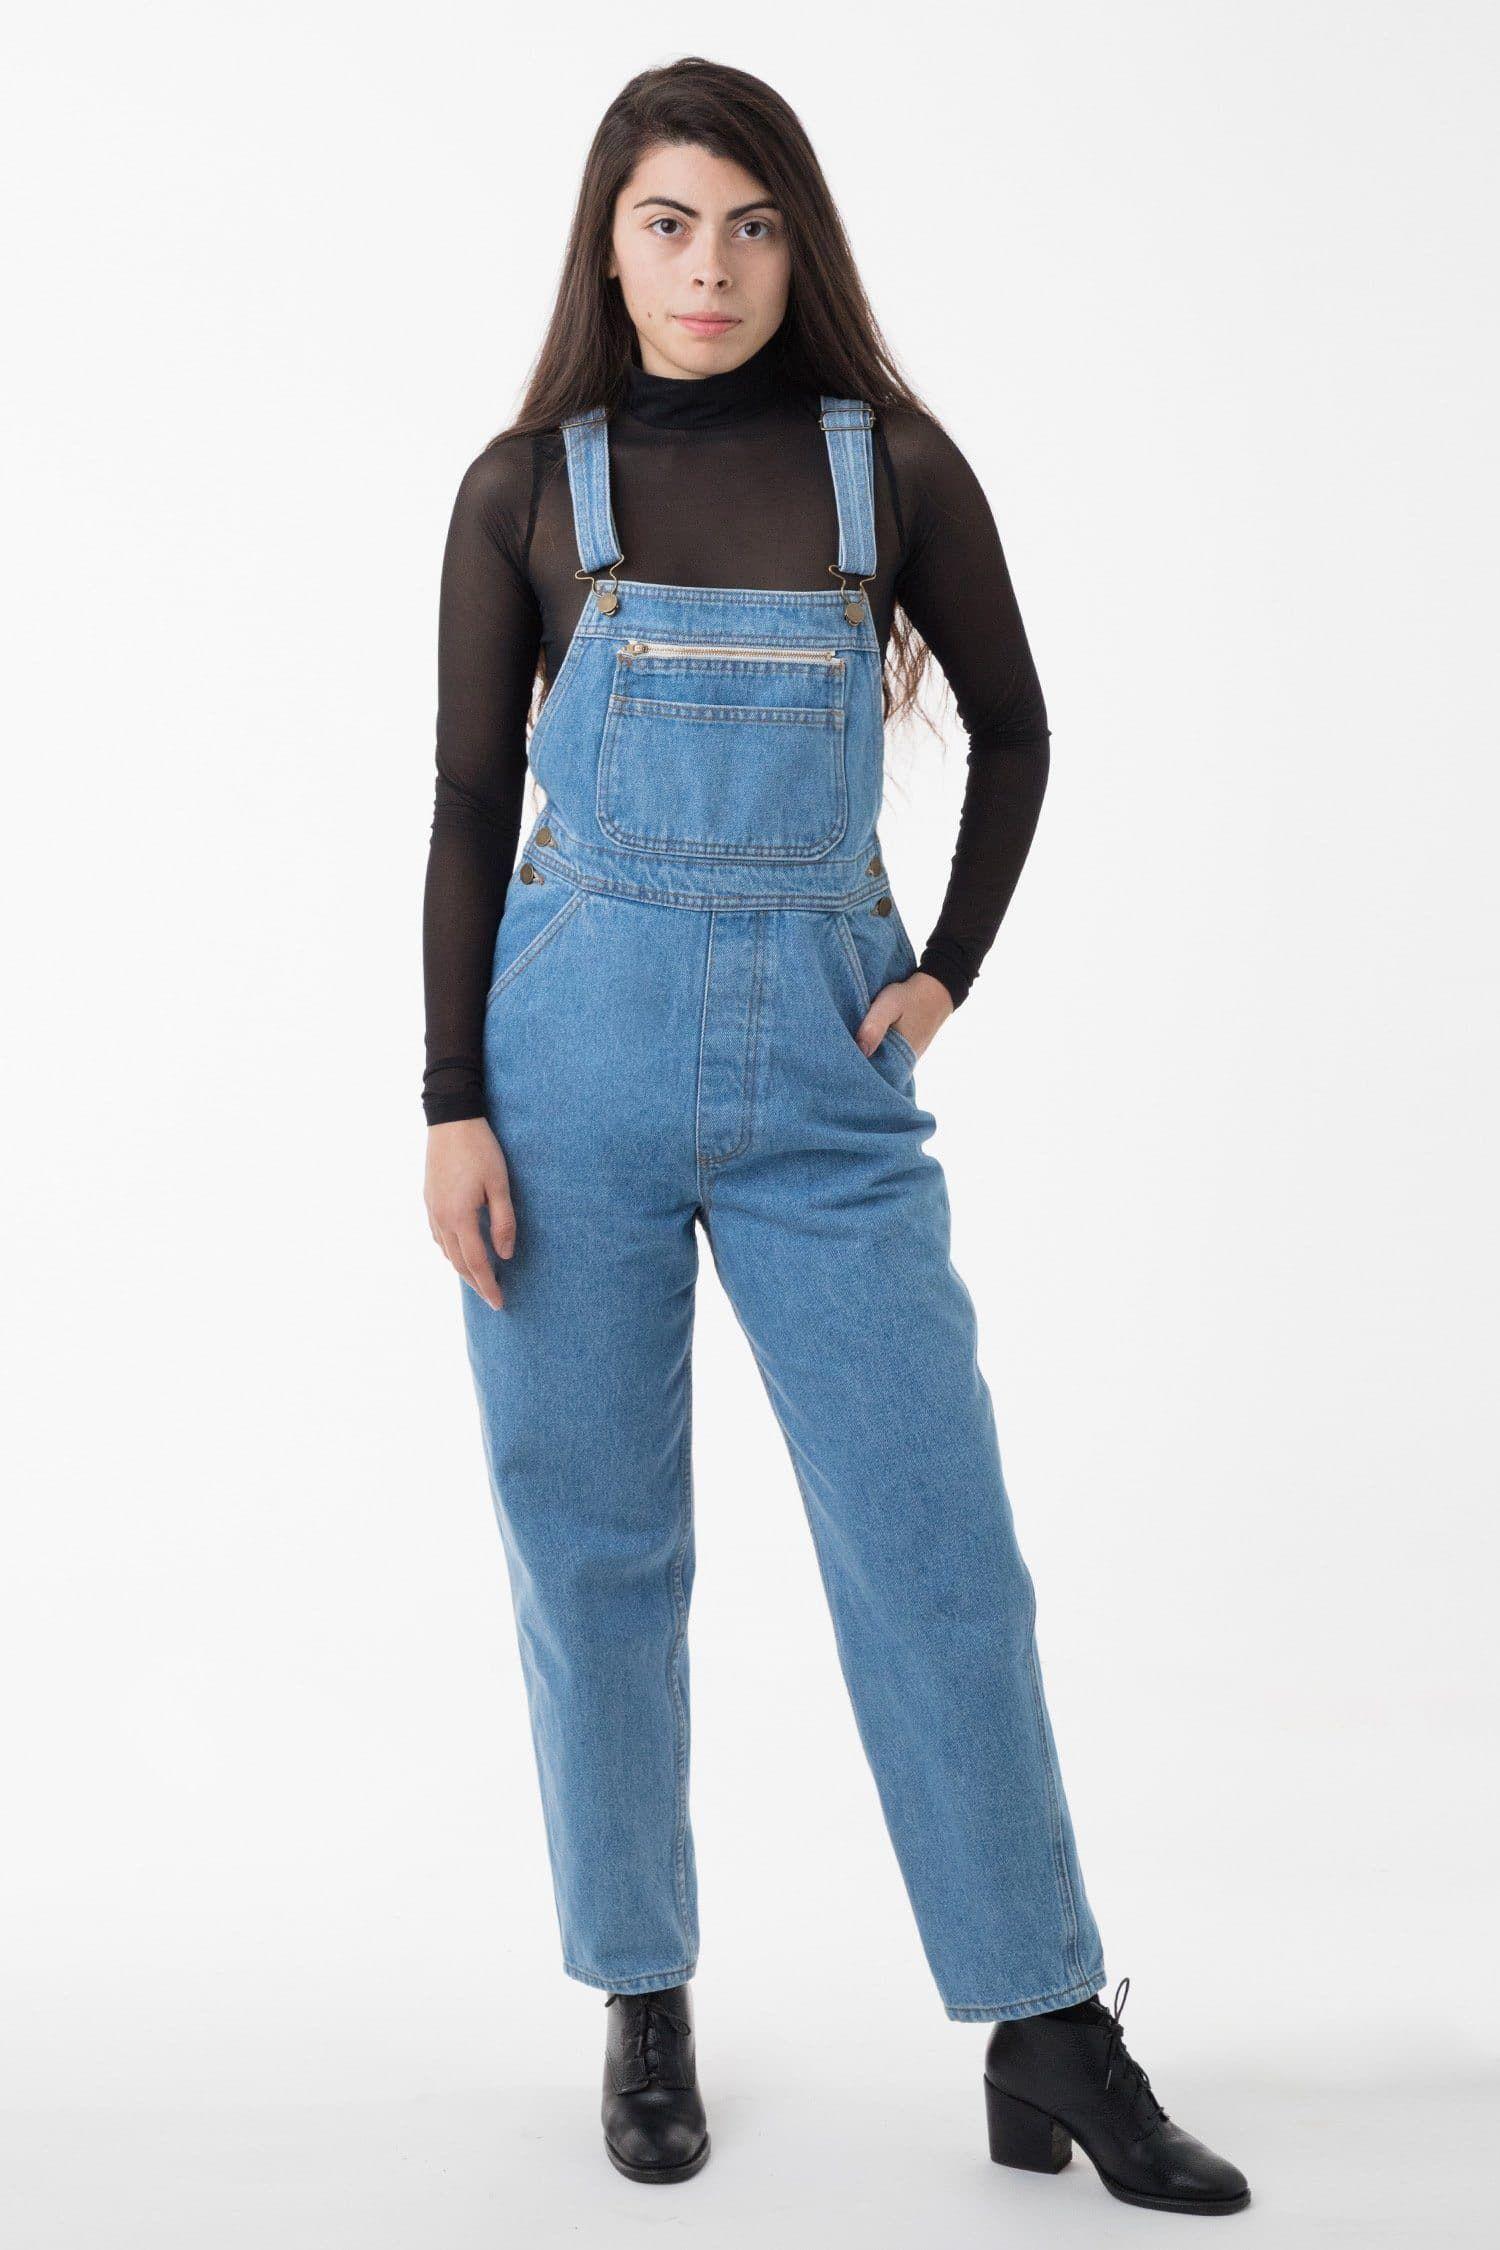 Rdnu07 Unisex Unisex 14 Oz Denim Overall In 2020 Overalls Denim Overalls American Made Clothing